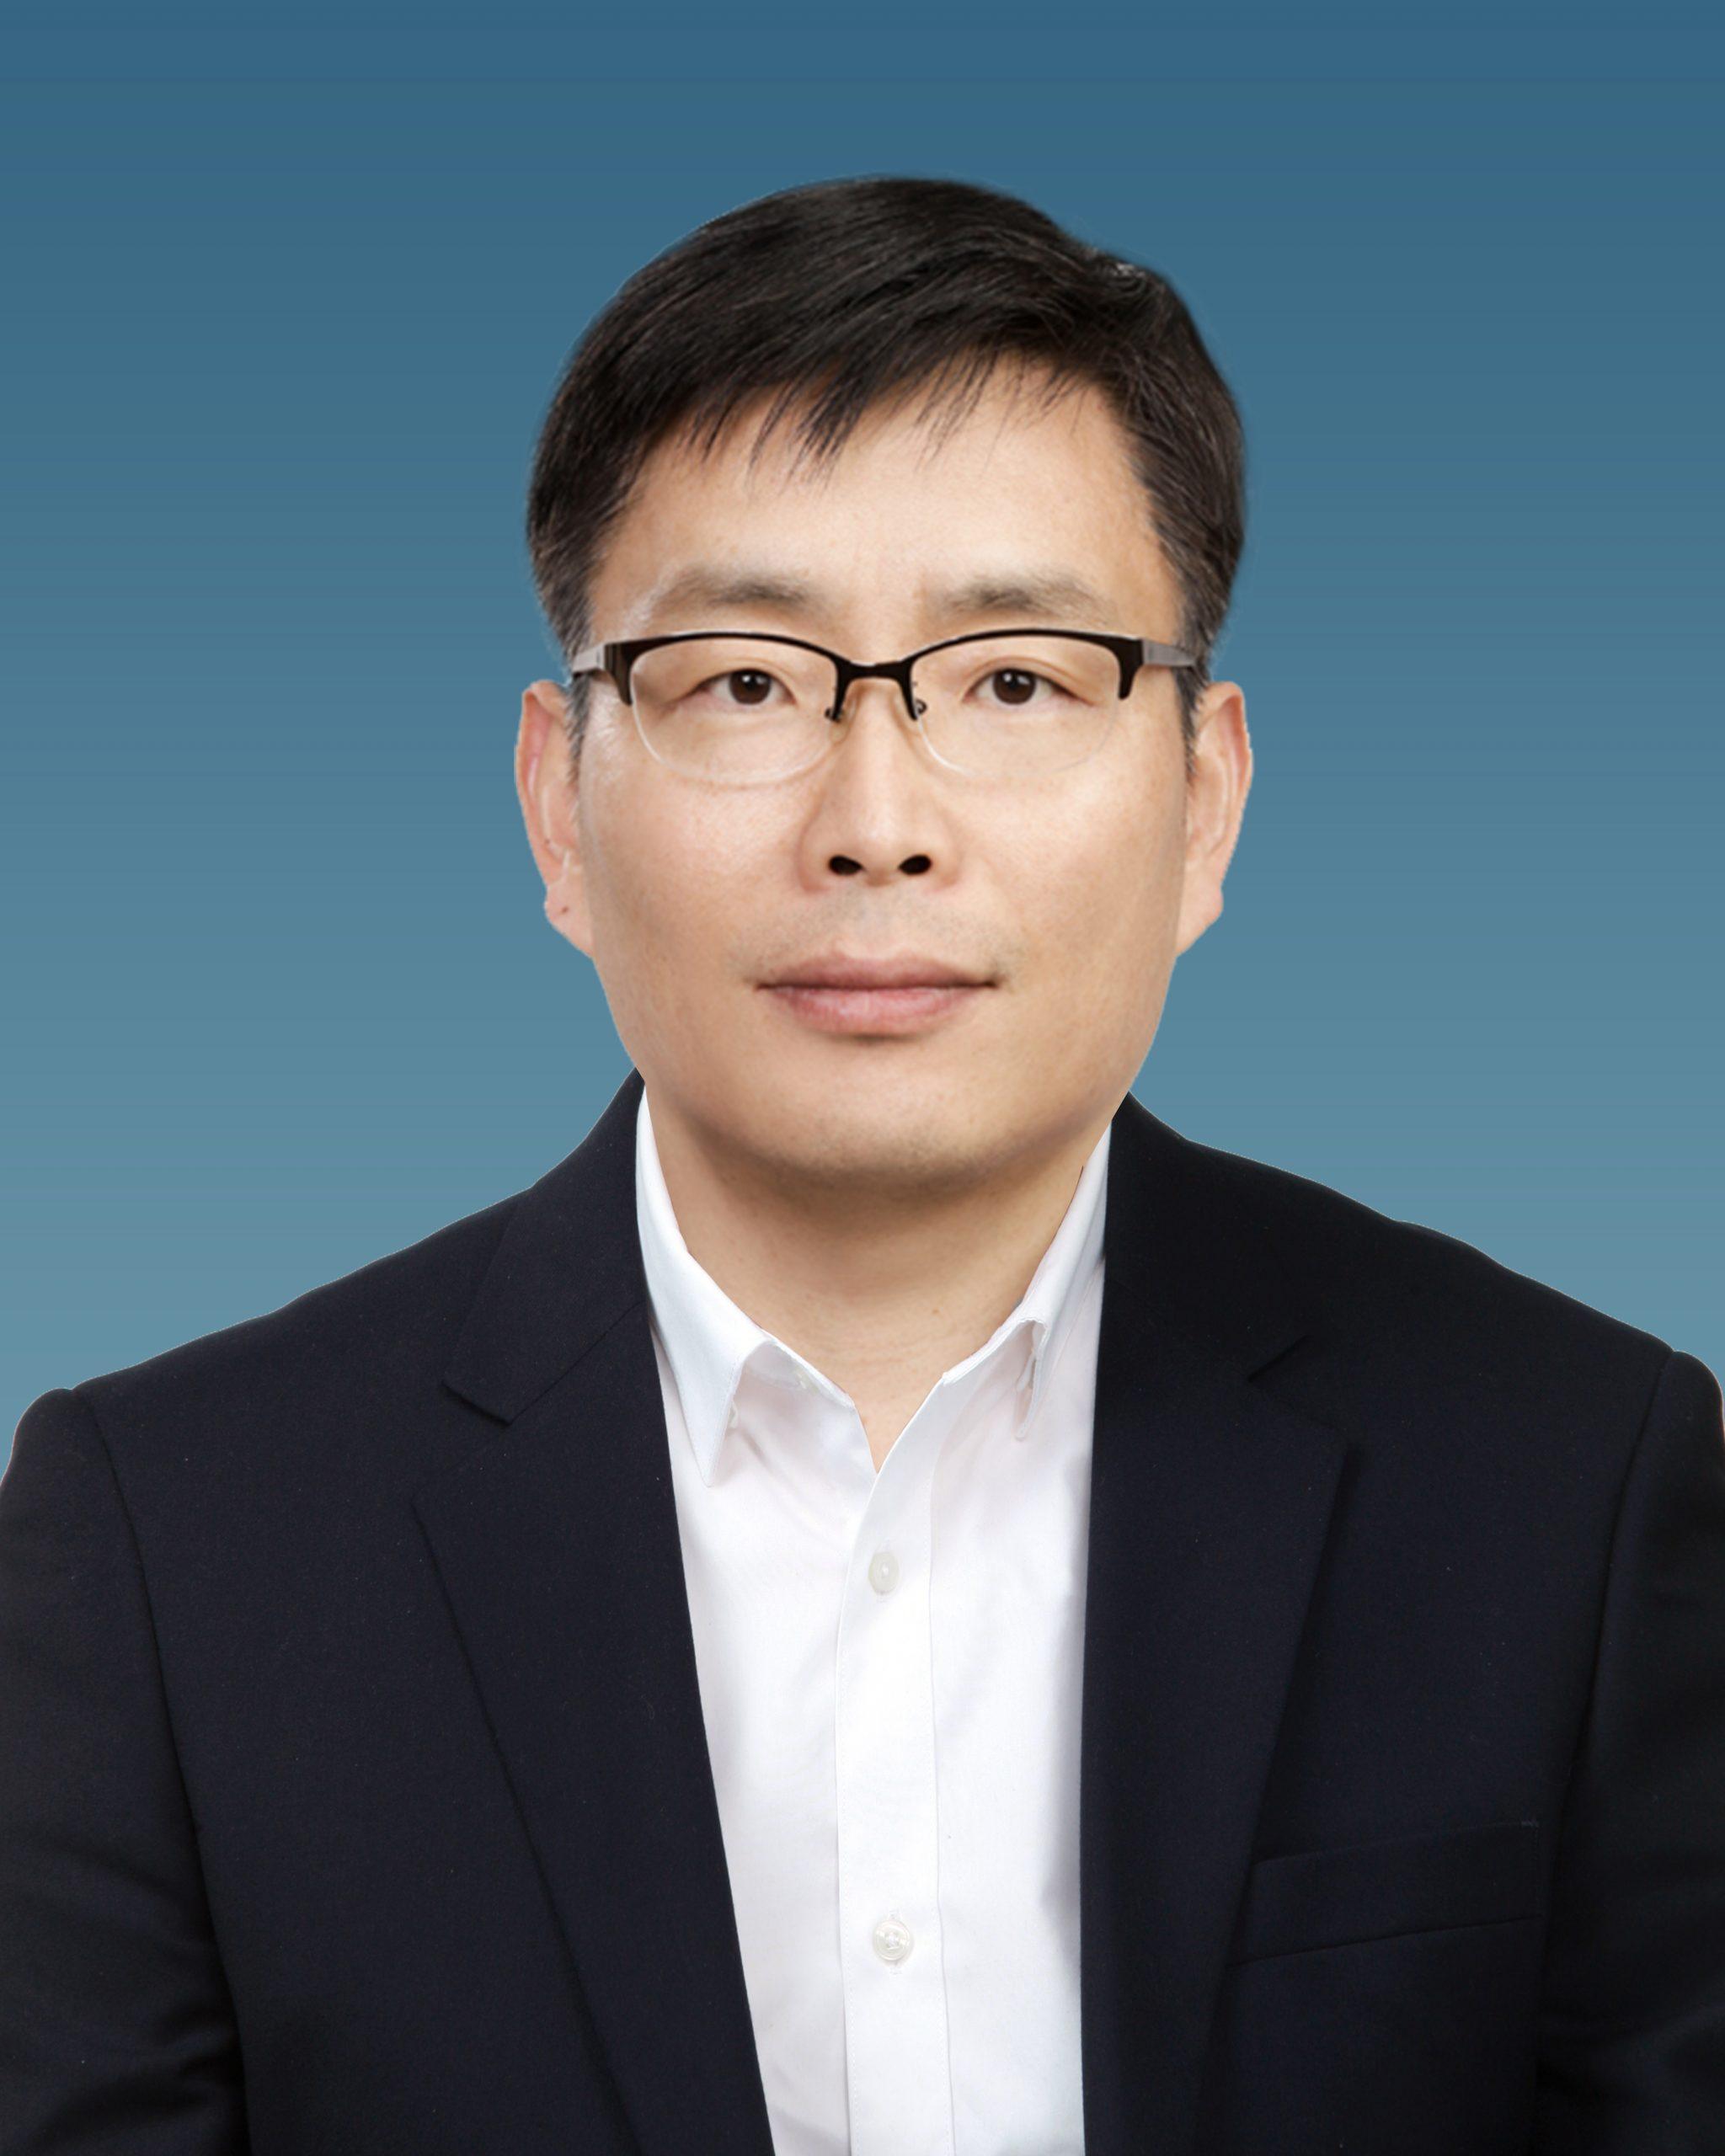 Mr. Jong Mun Choi